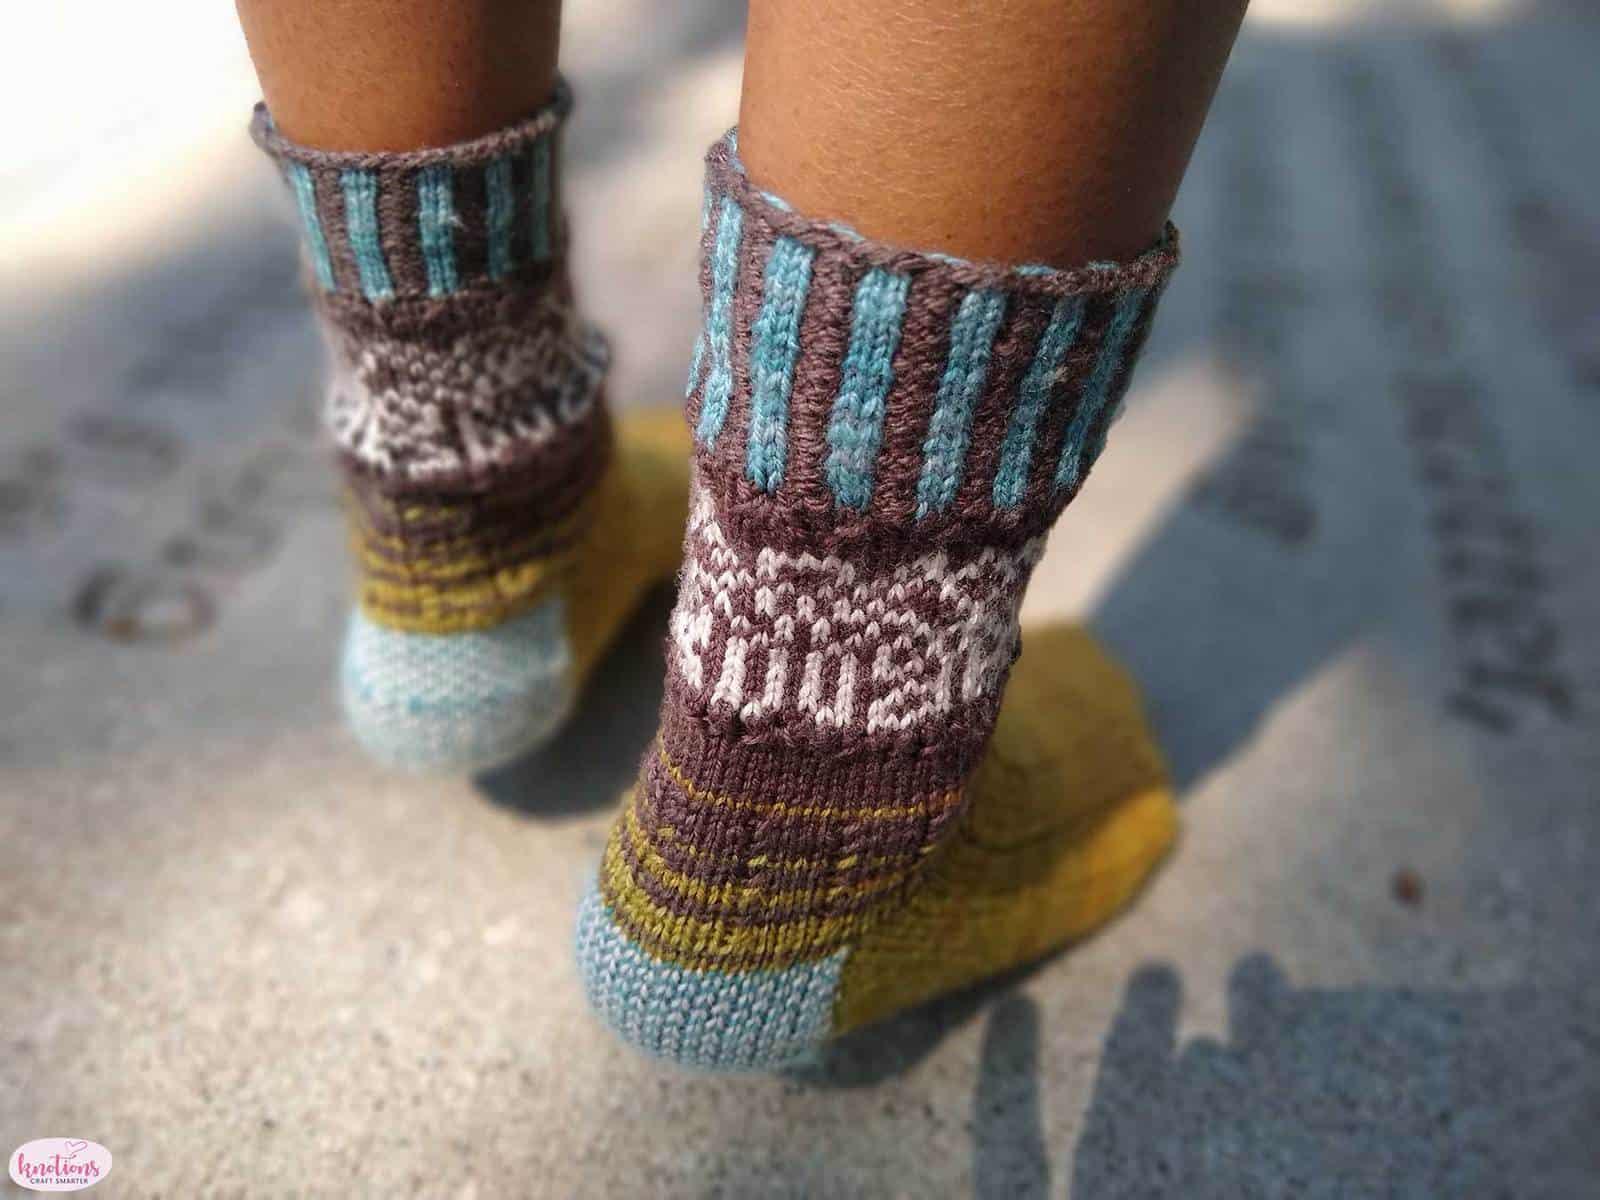 carved-wood-socks-10